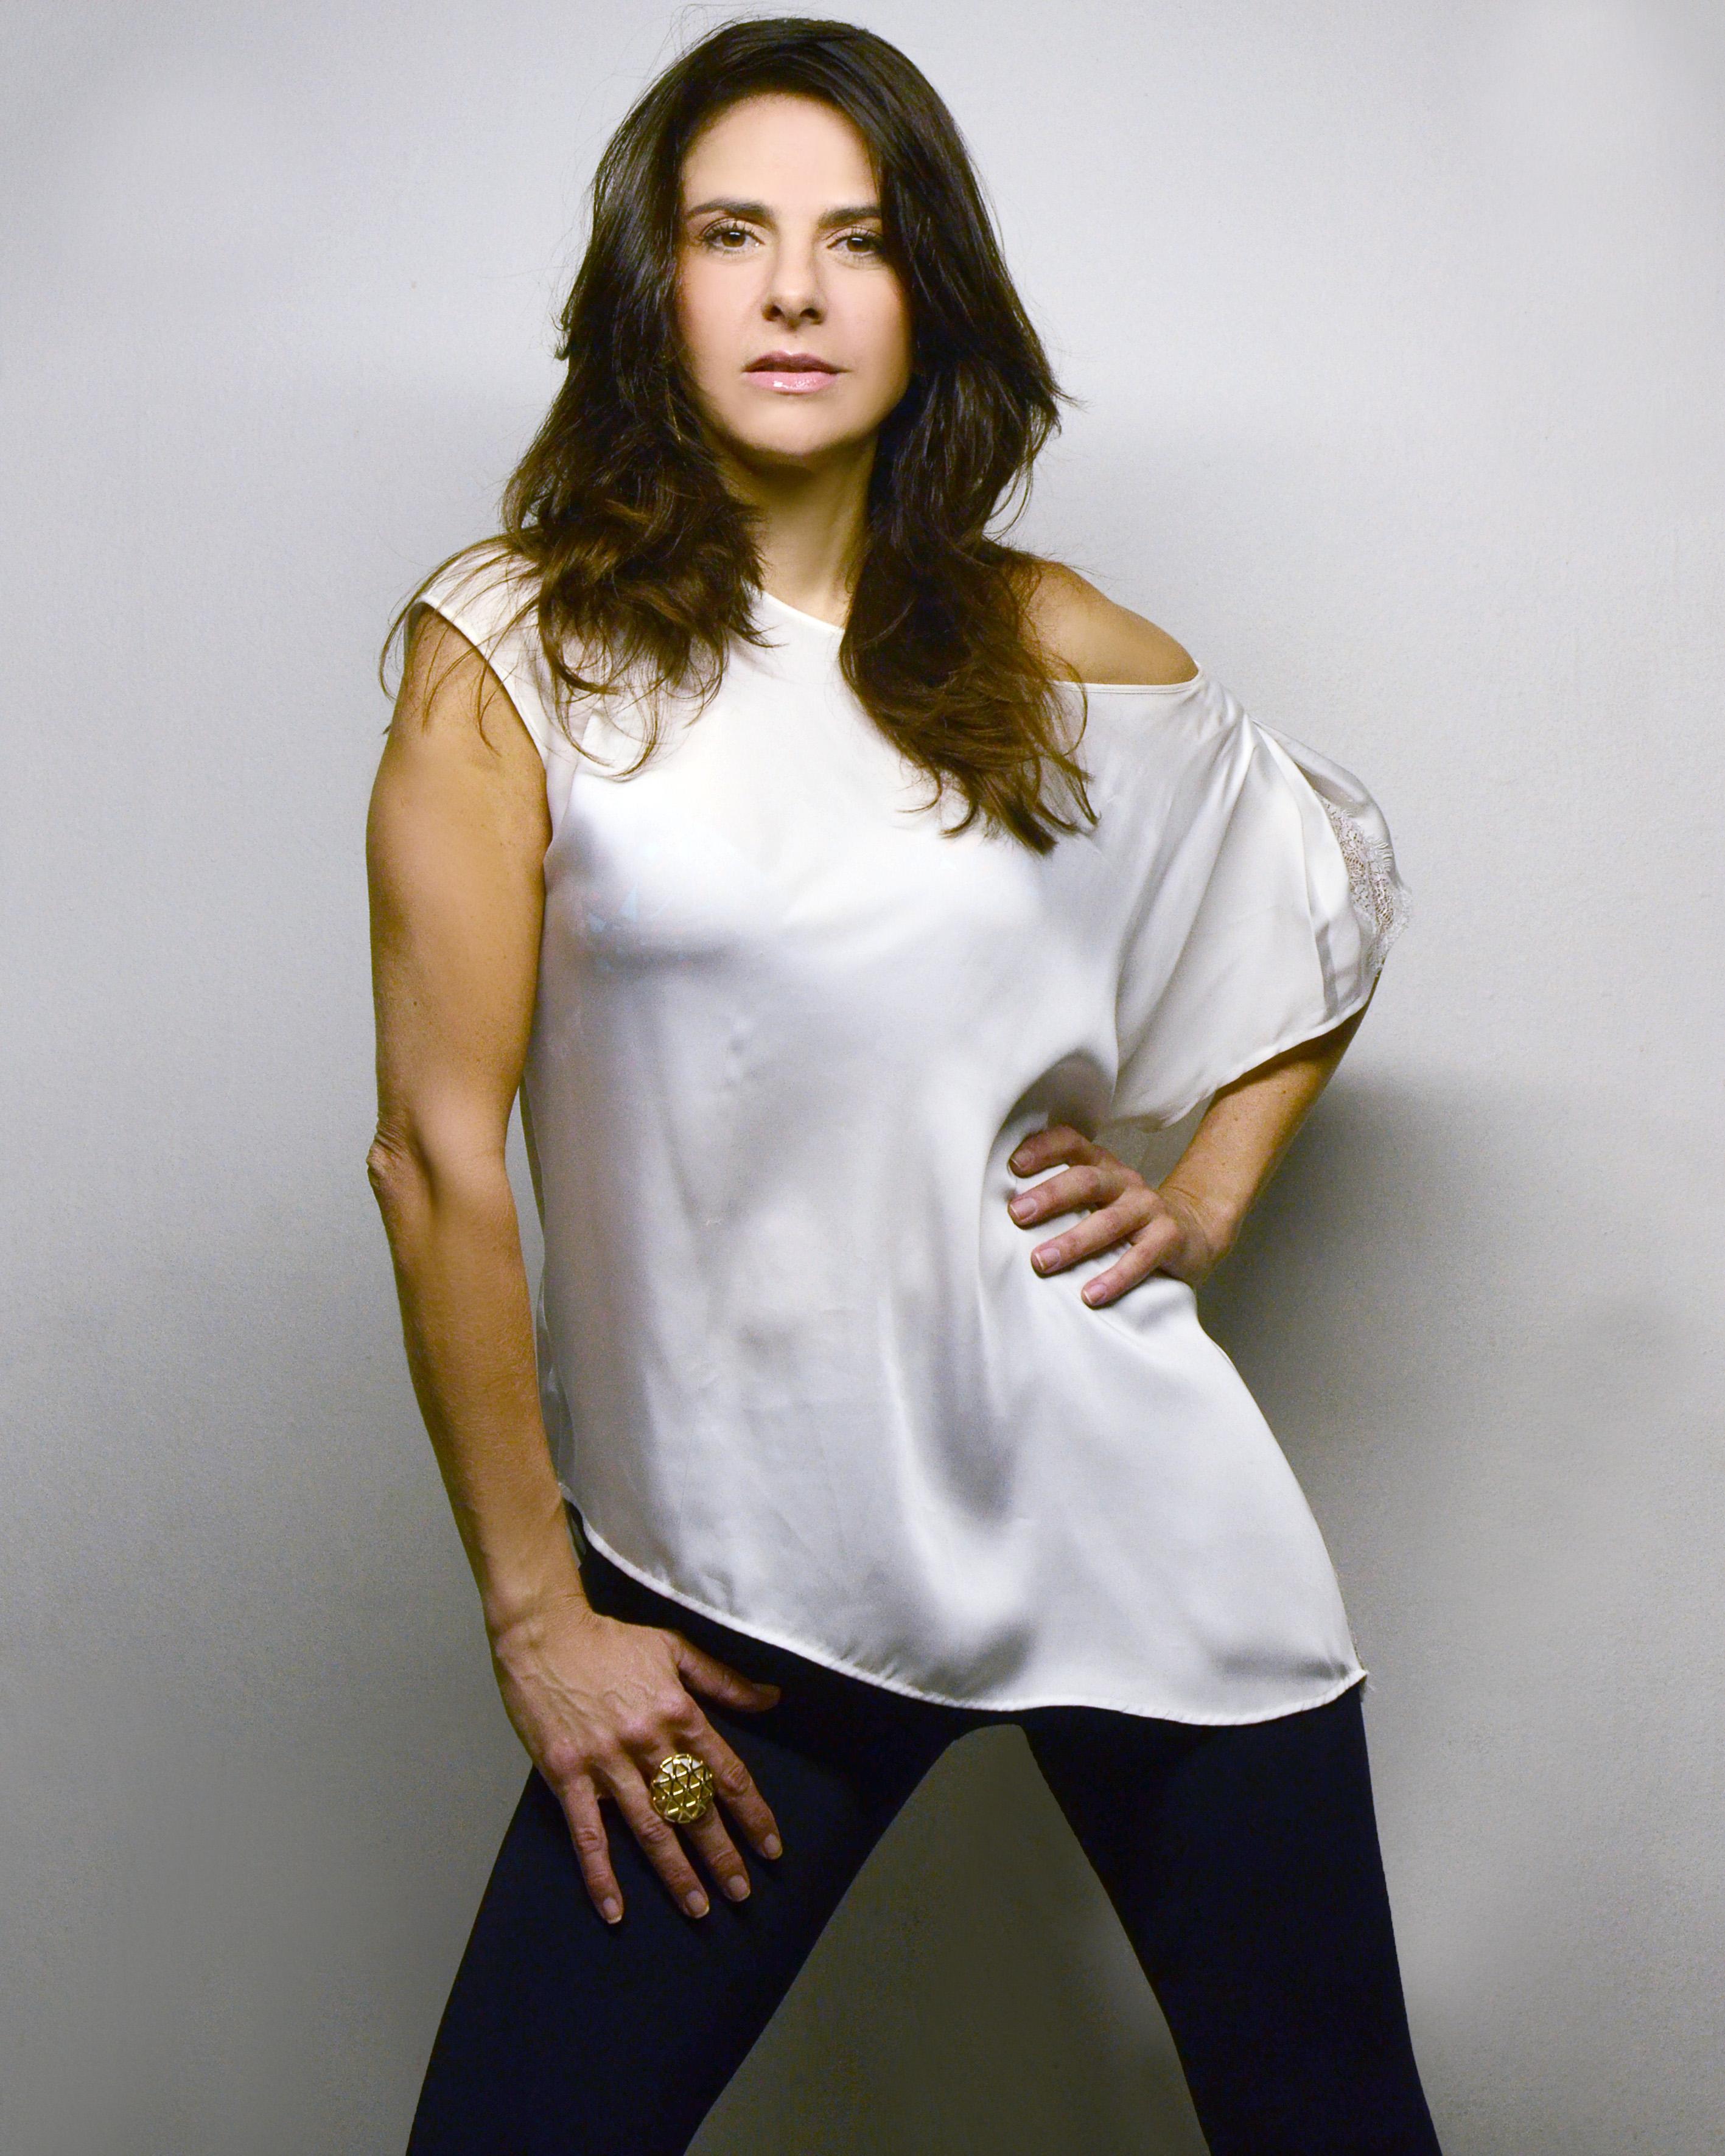 Vanessa Palazzi (3)